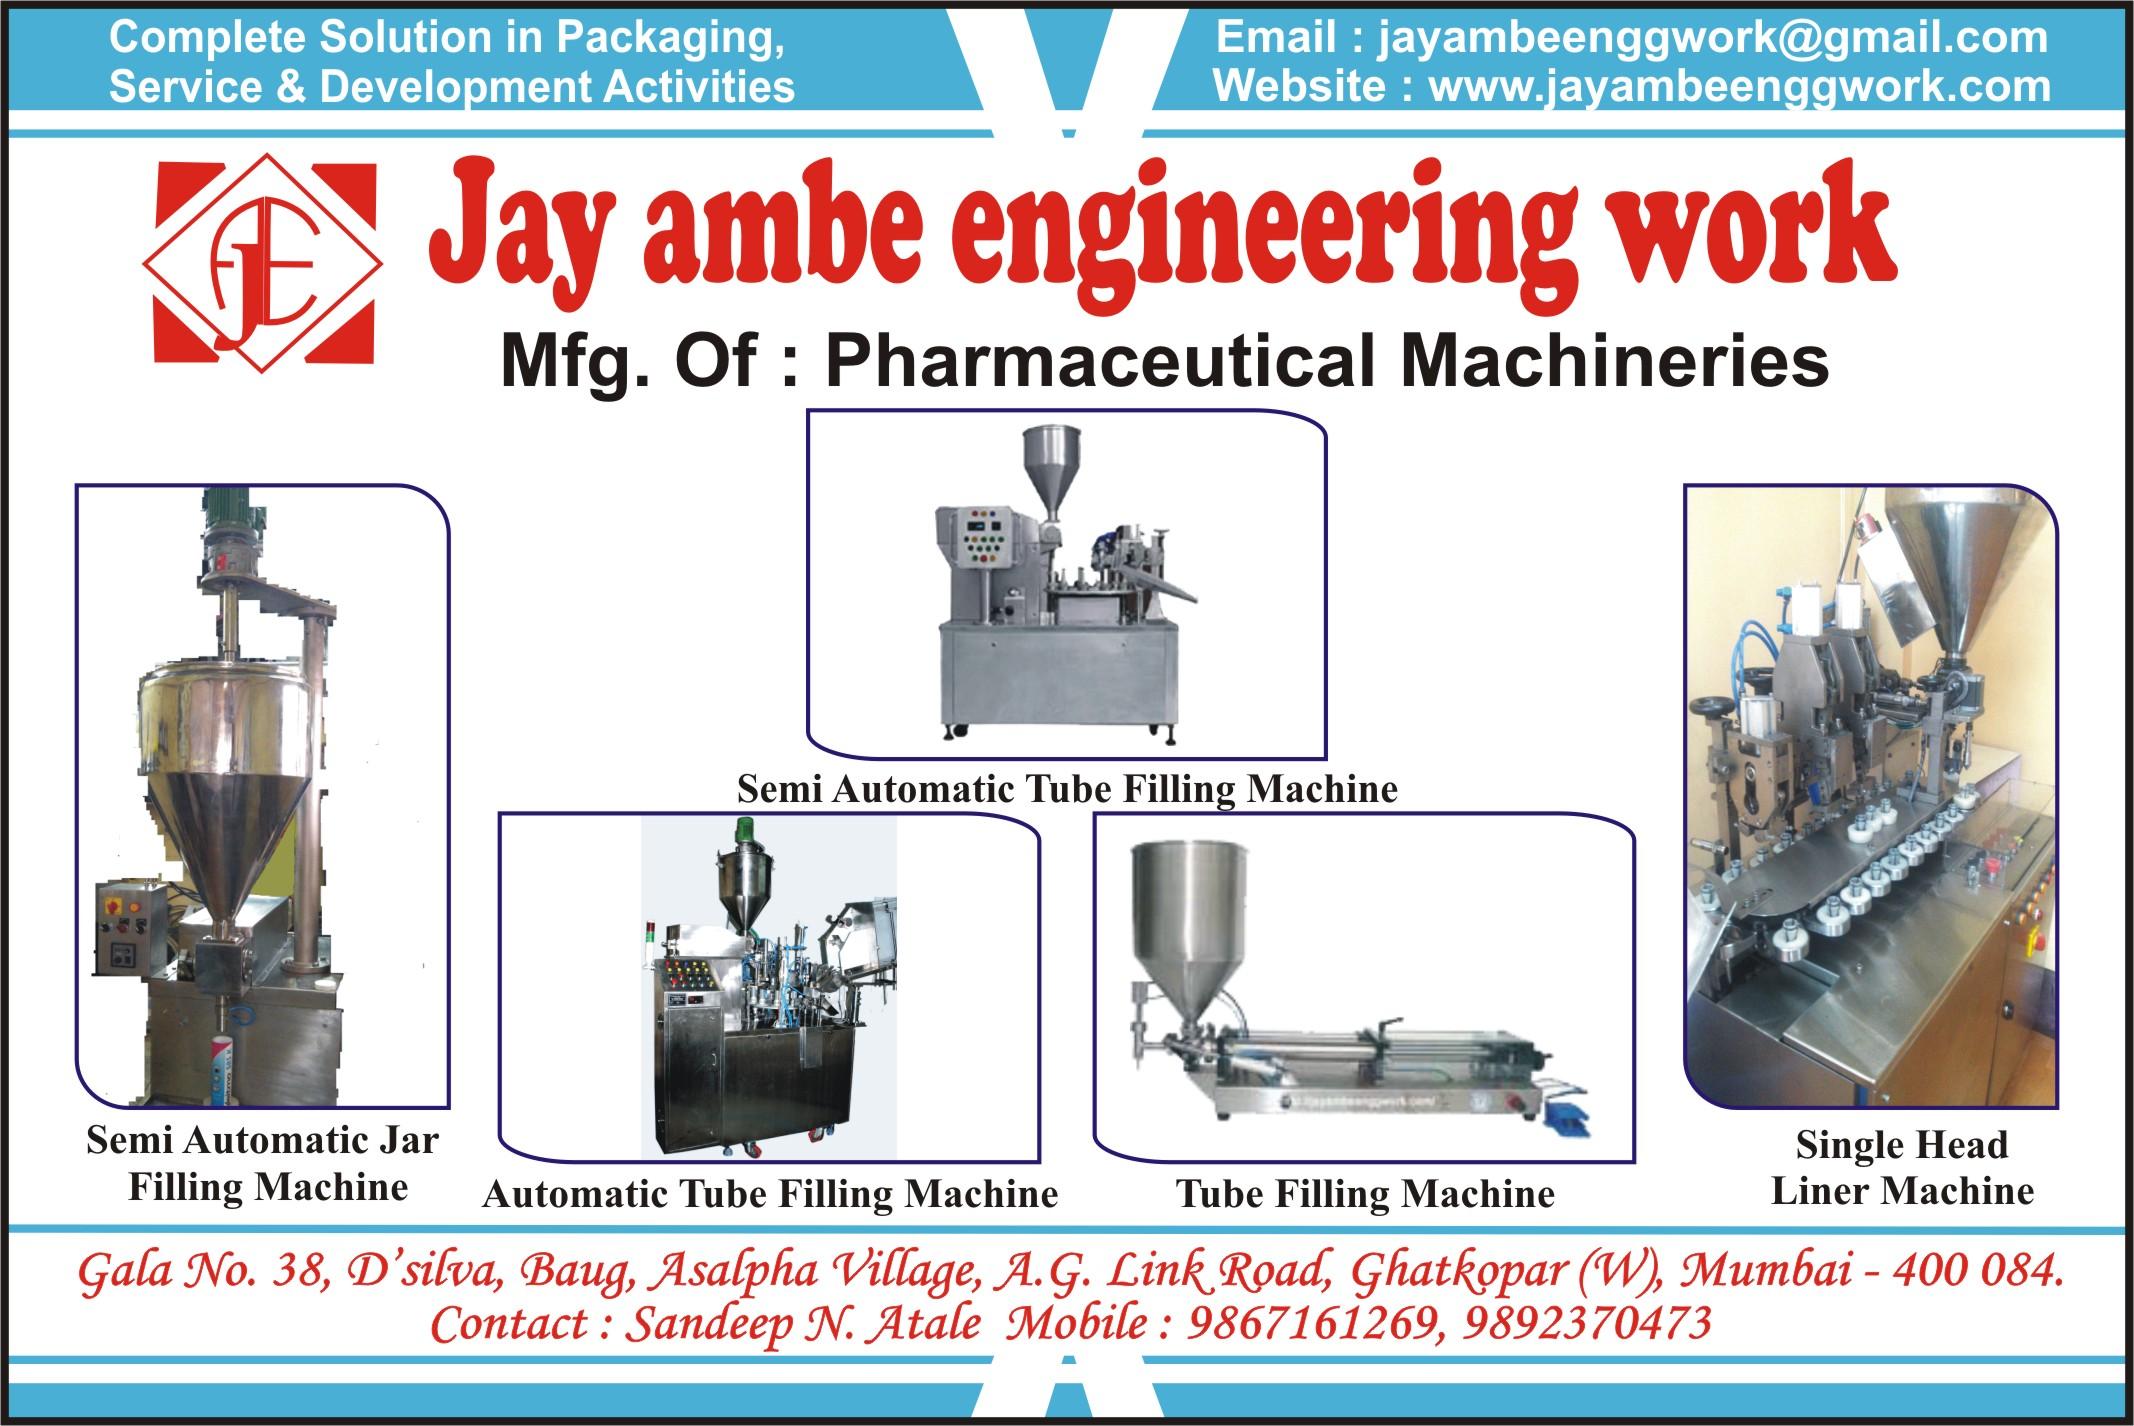 JAY AMBE ENGINEERING WORK